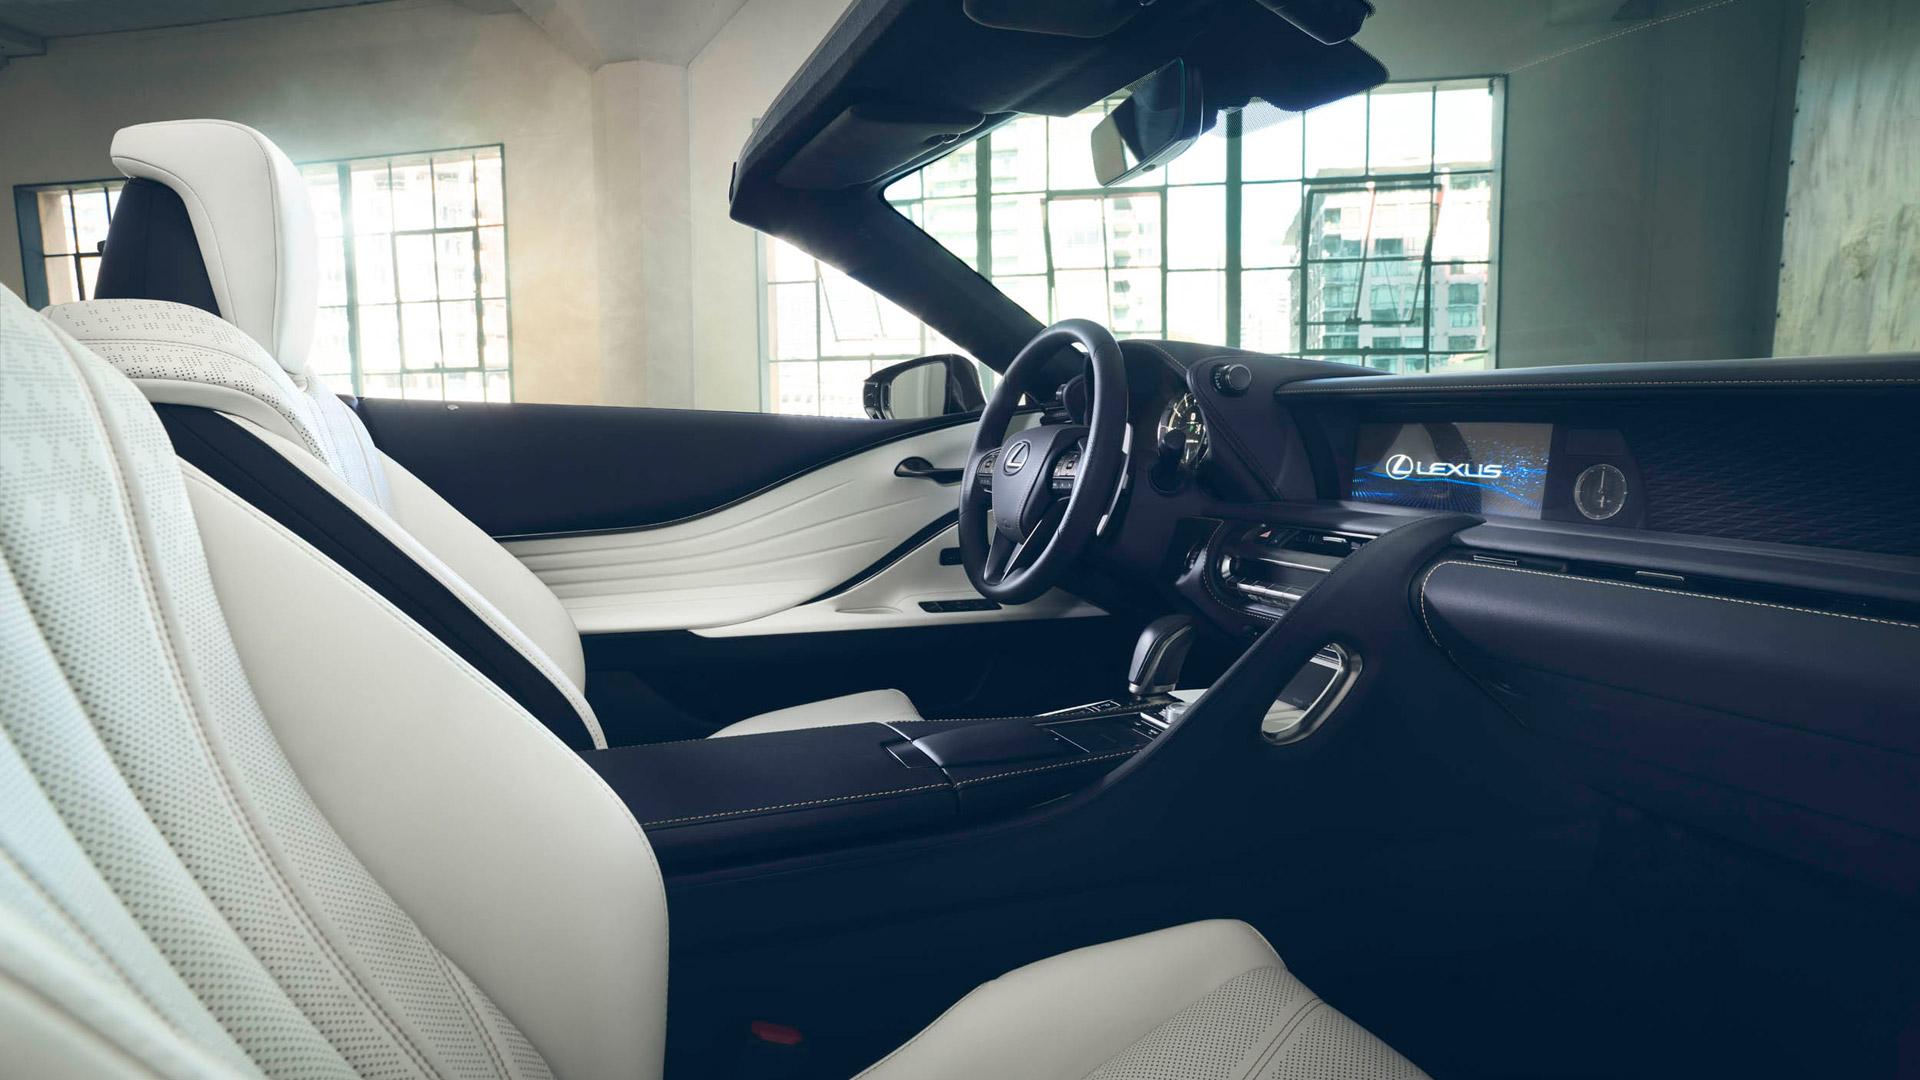 Lexus LC convertible Concept gallery06